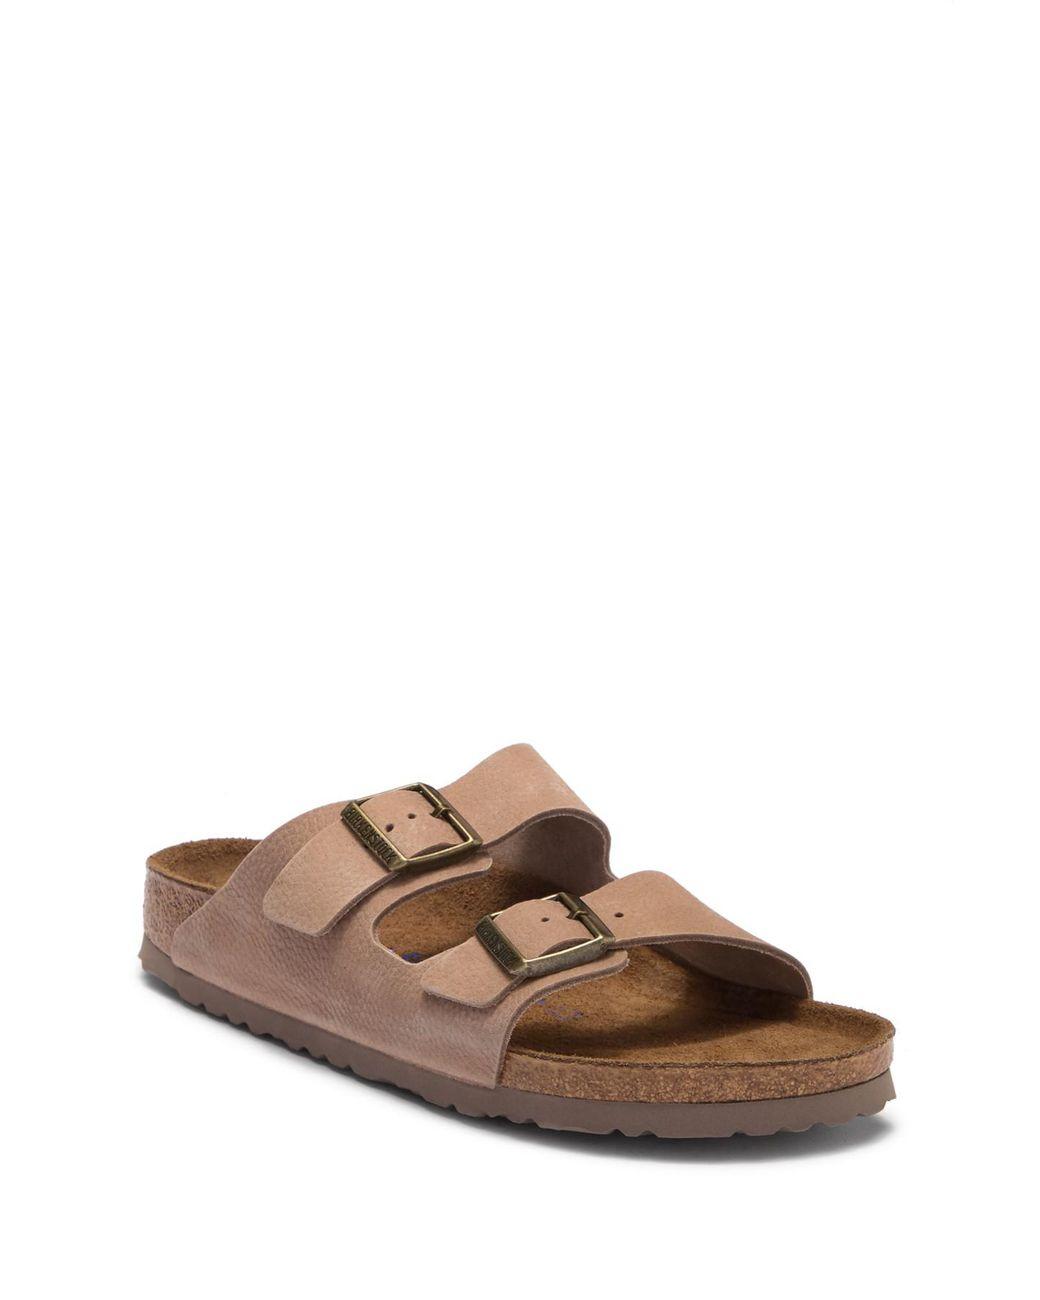 Nubuck Slip Lyst Soft Arizona Footbed Sandal Birkenstock On 5R3jq4AL